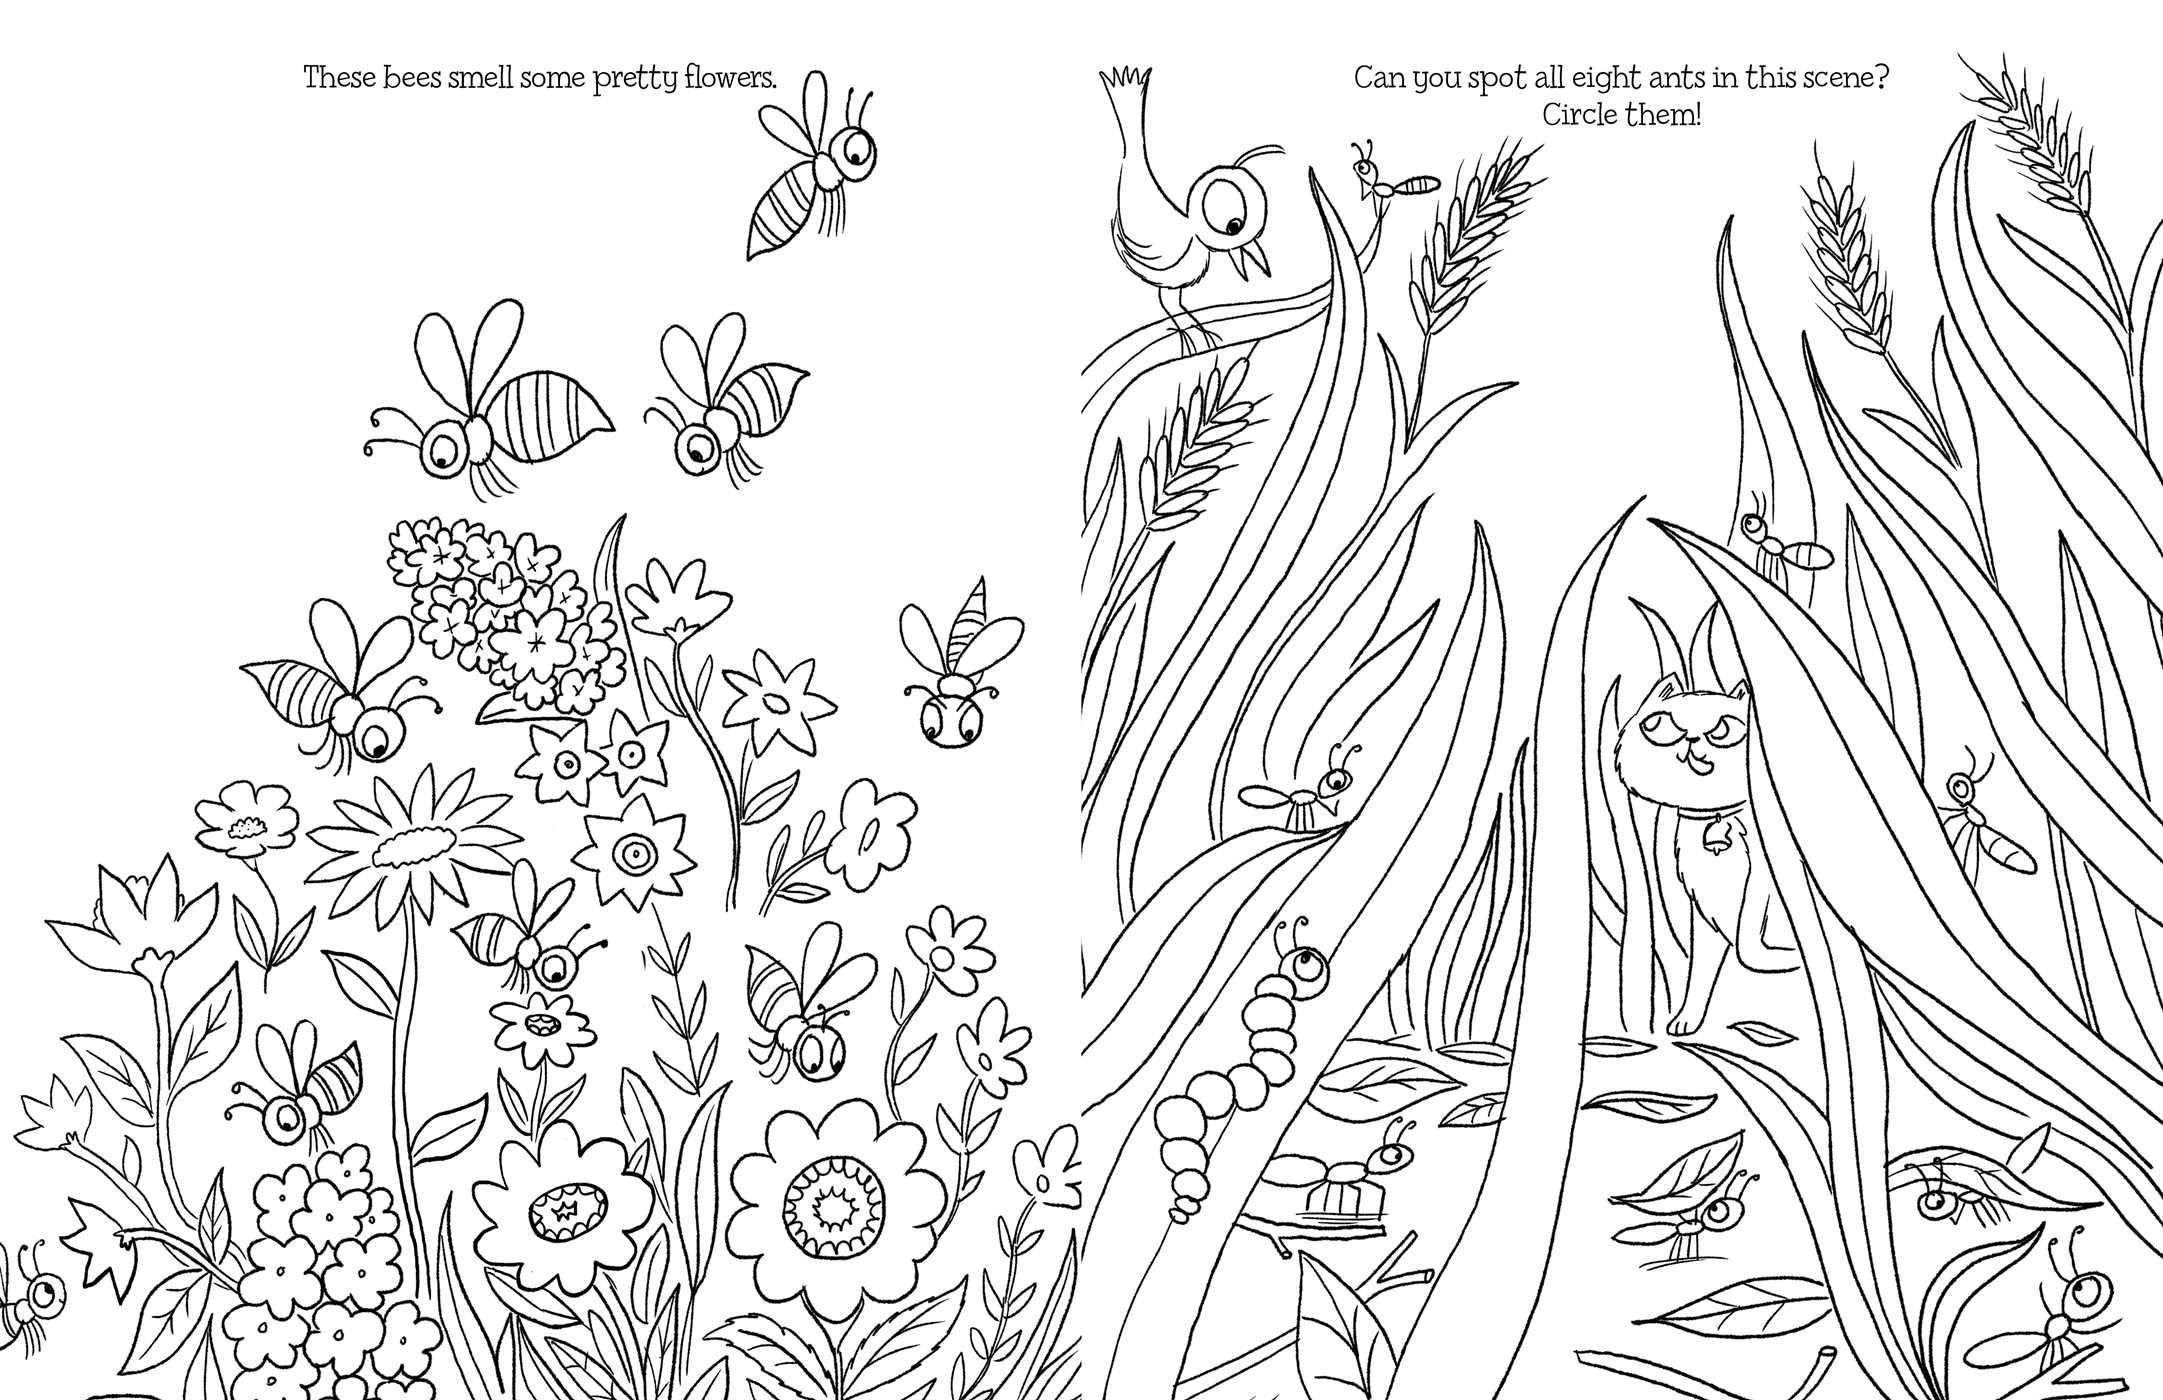 Dream doodle draw make believe magic 9781481462914.in07